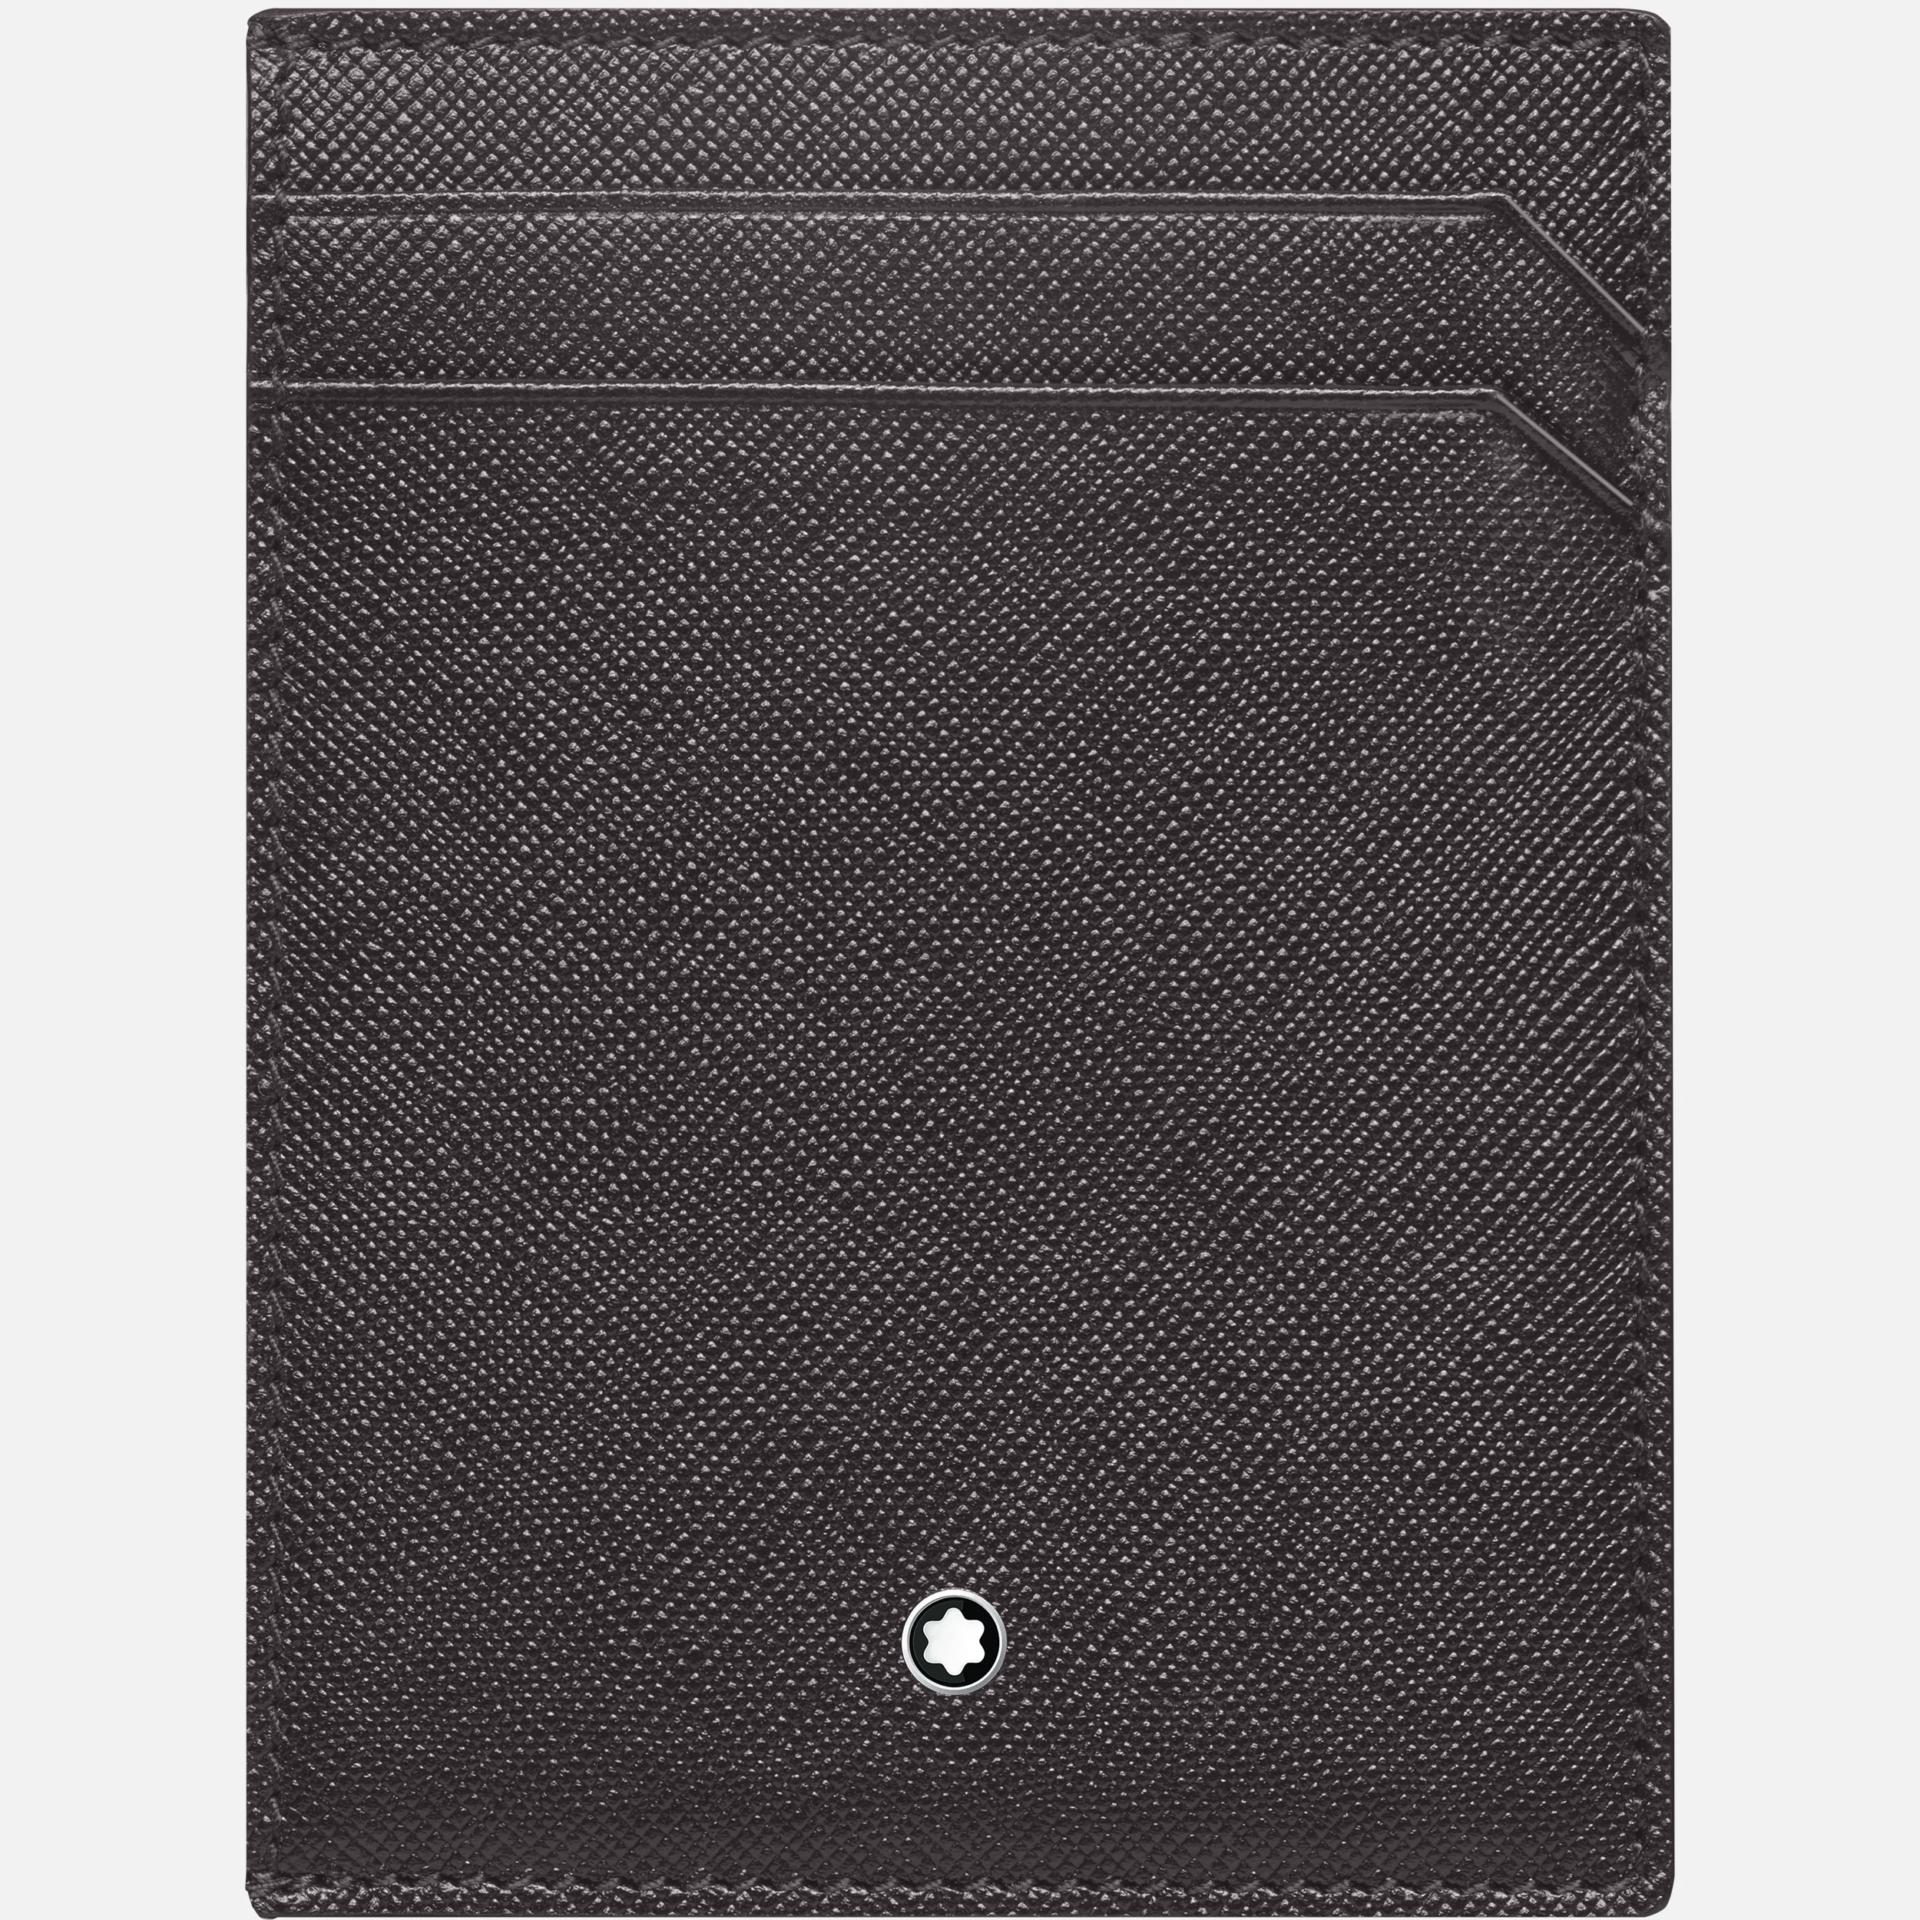 Porte-cartes 4cc avec insert carte id, Sartorial gris, Montblanc